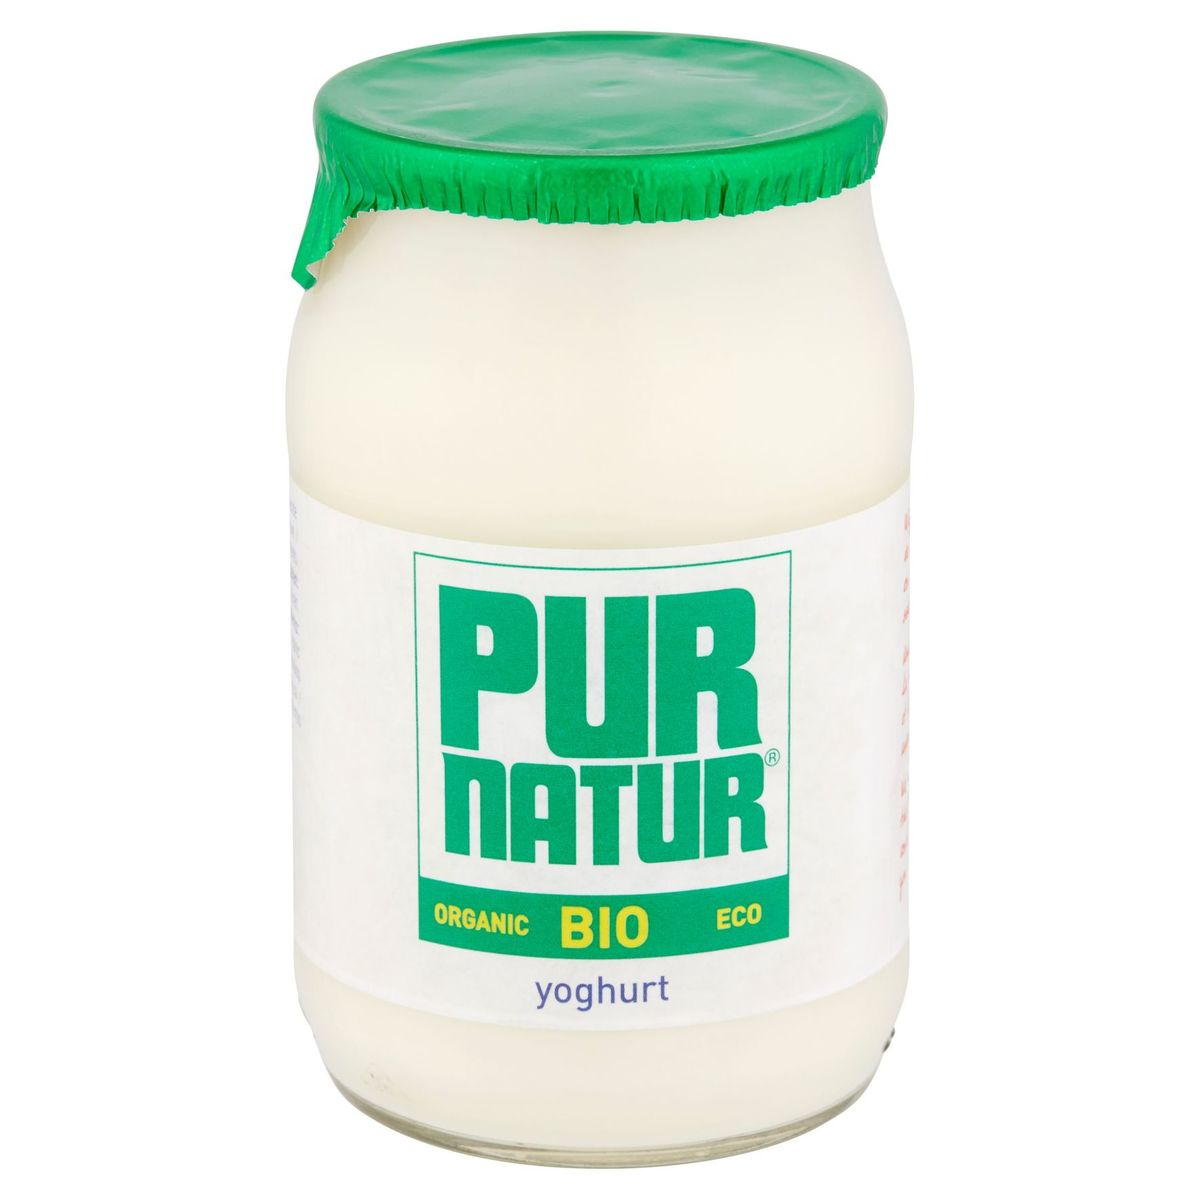 Pur Natur Bio Yoghurt 150 g